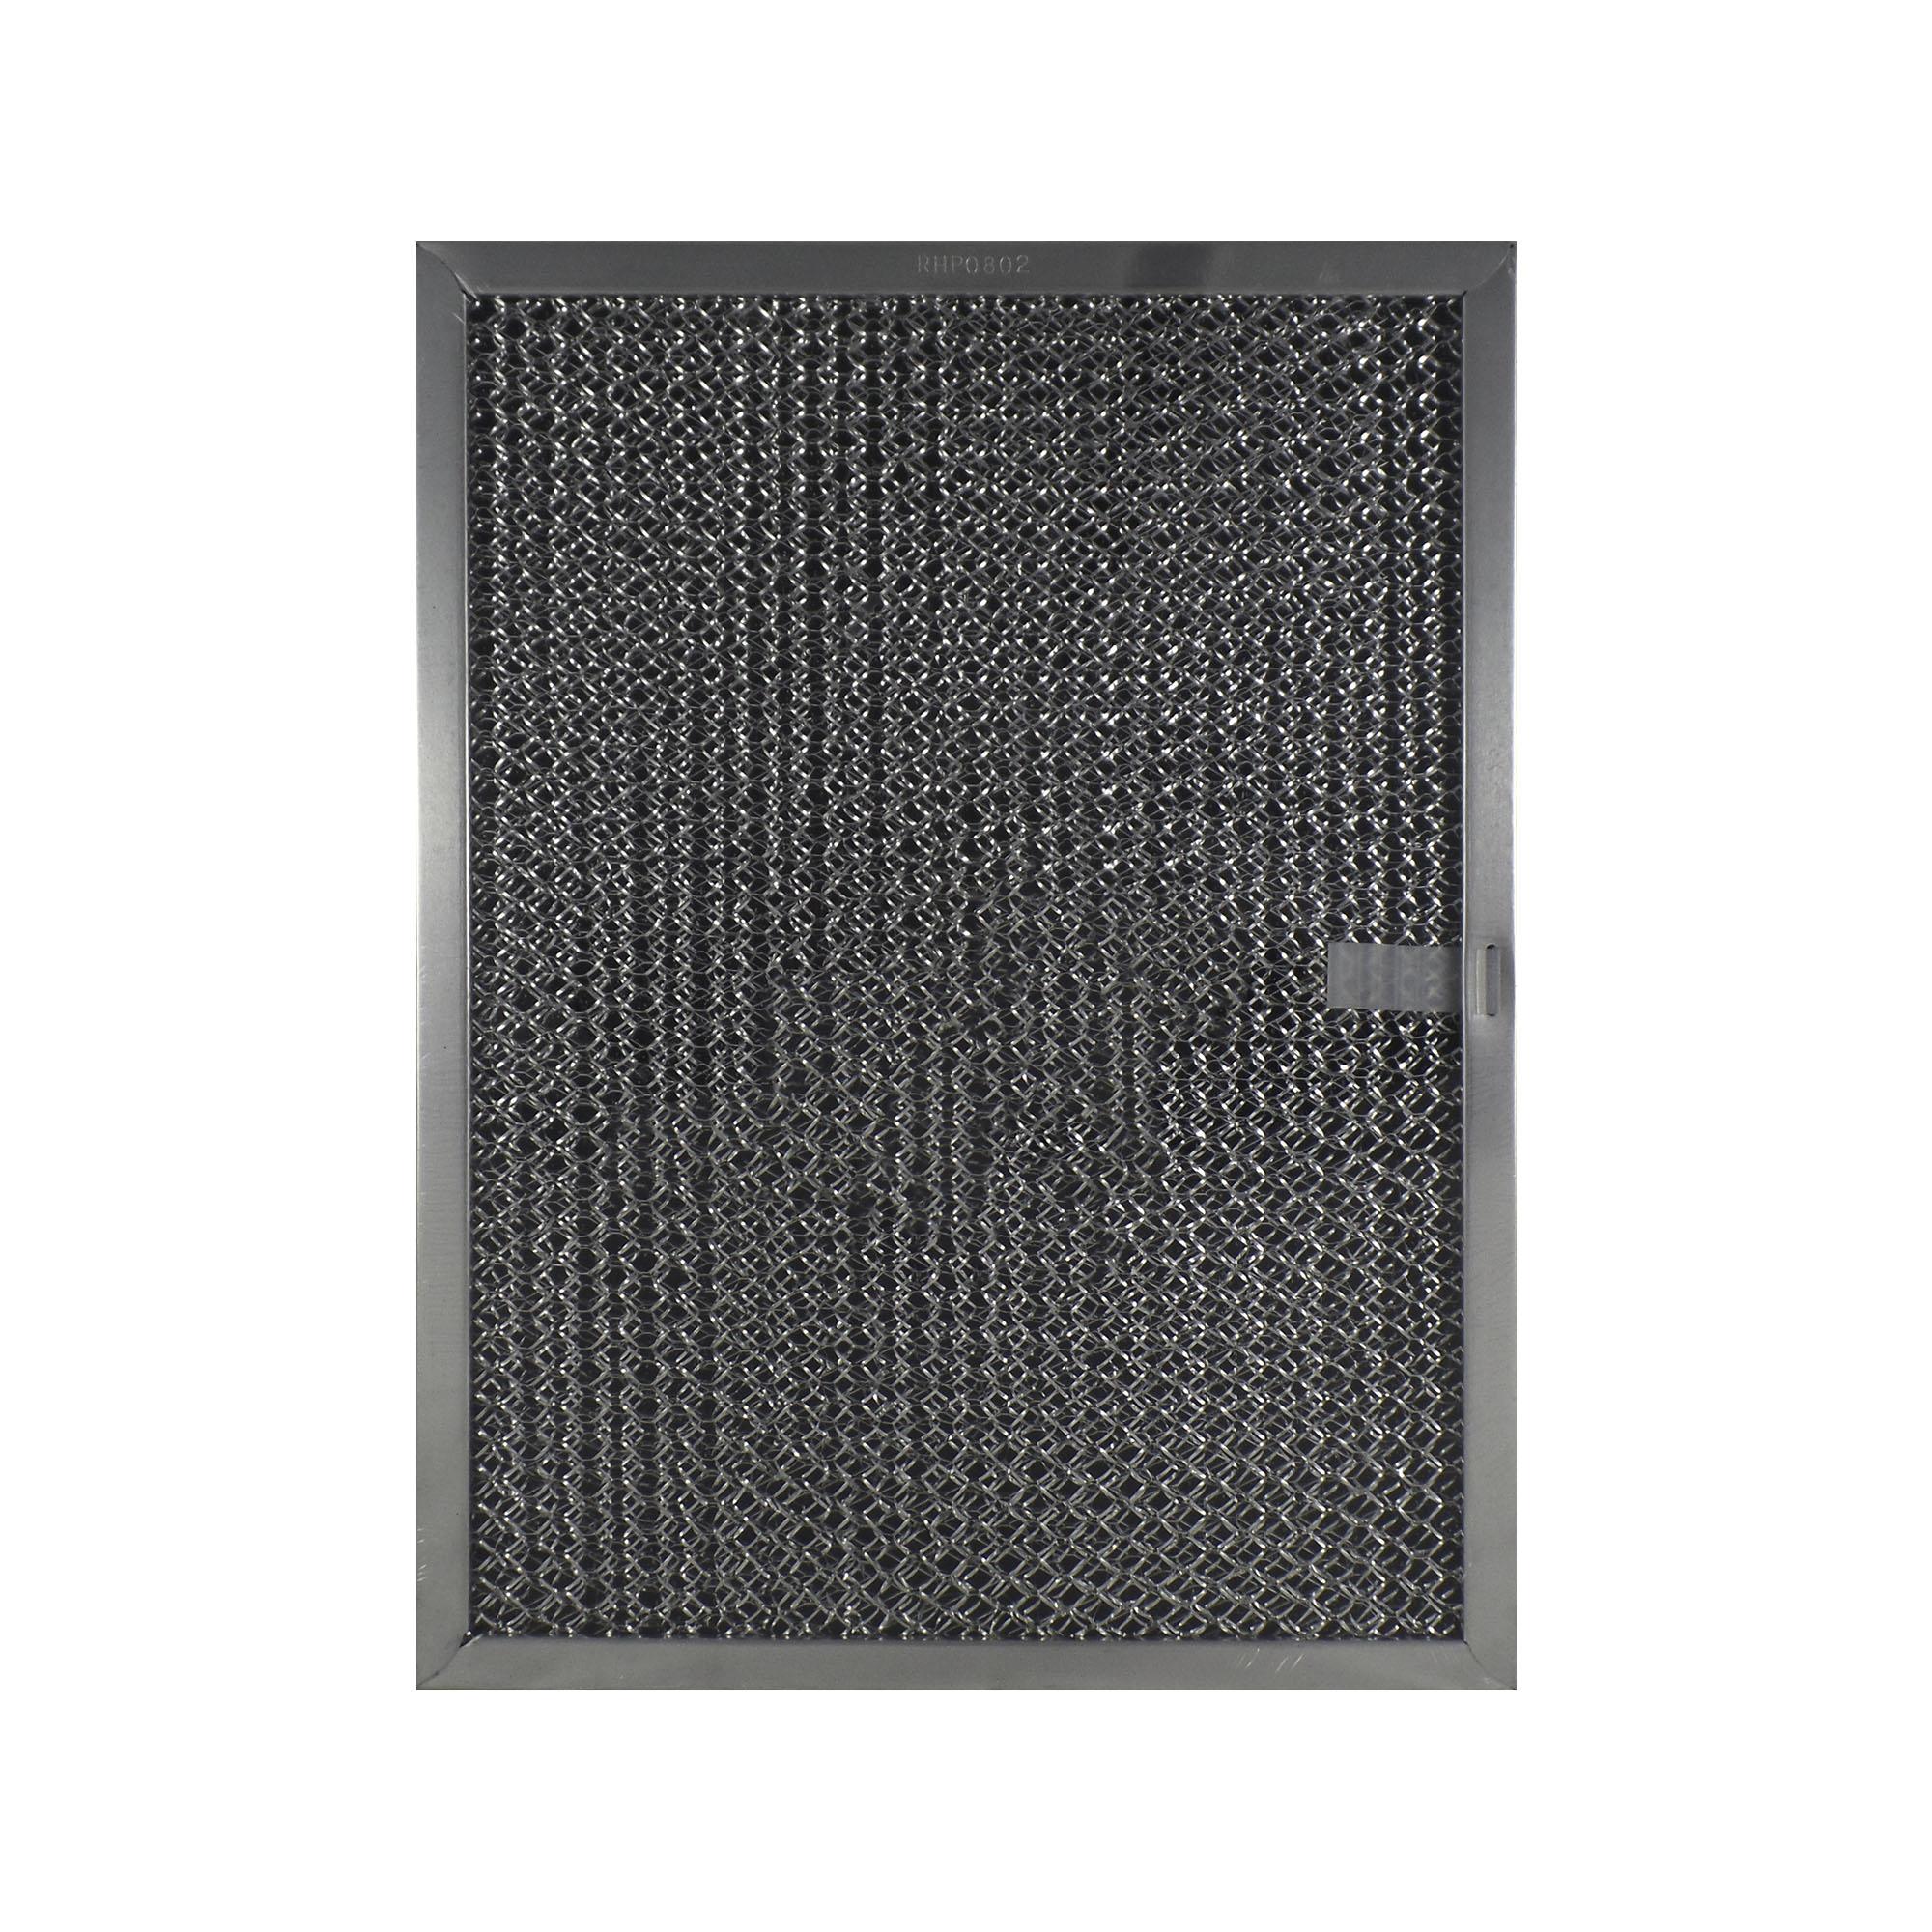 Nutone Model Rl6200 Aluminum Carbon Combo Range Hood Filter